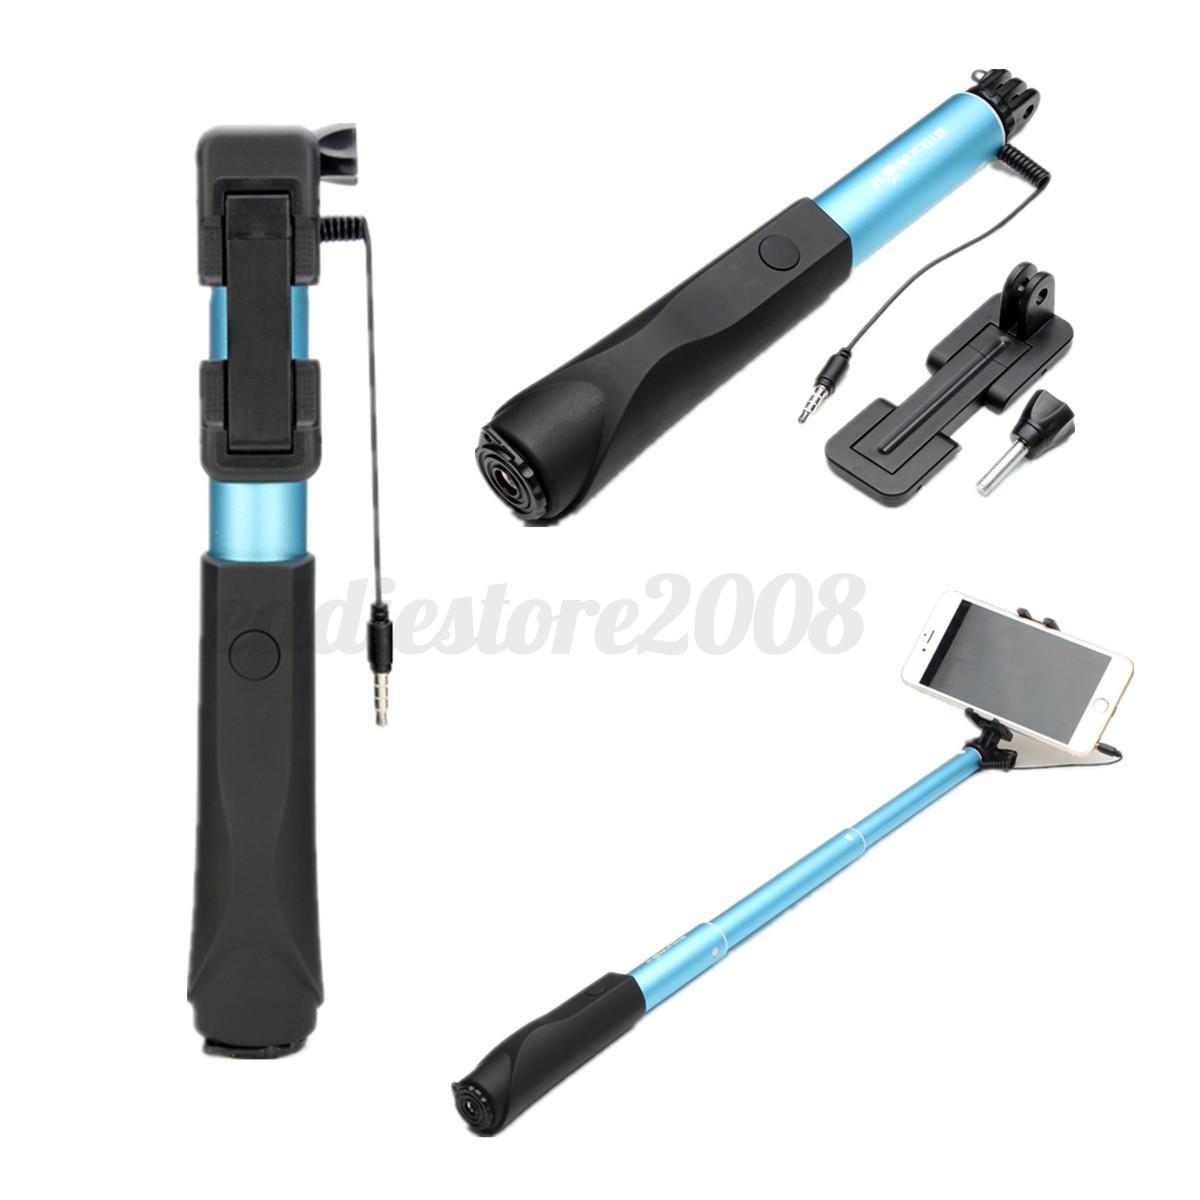 blitzwolf universal extendable mini wire selfie stick monopod for mobliephone ebay. Black Bedroom Furniture Sets. Home Design Ideas